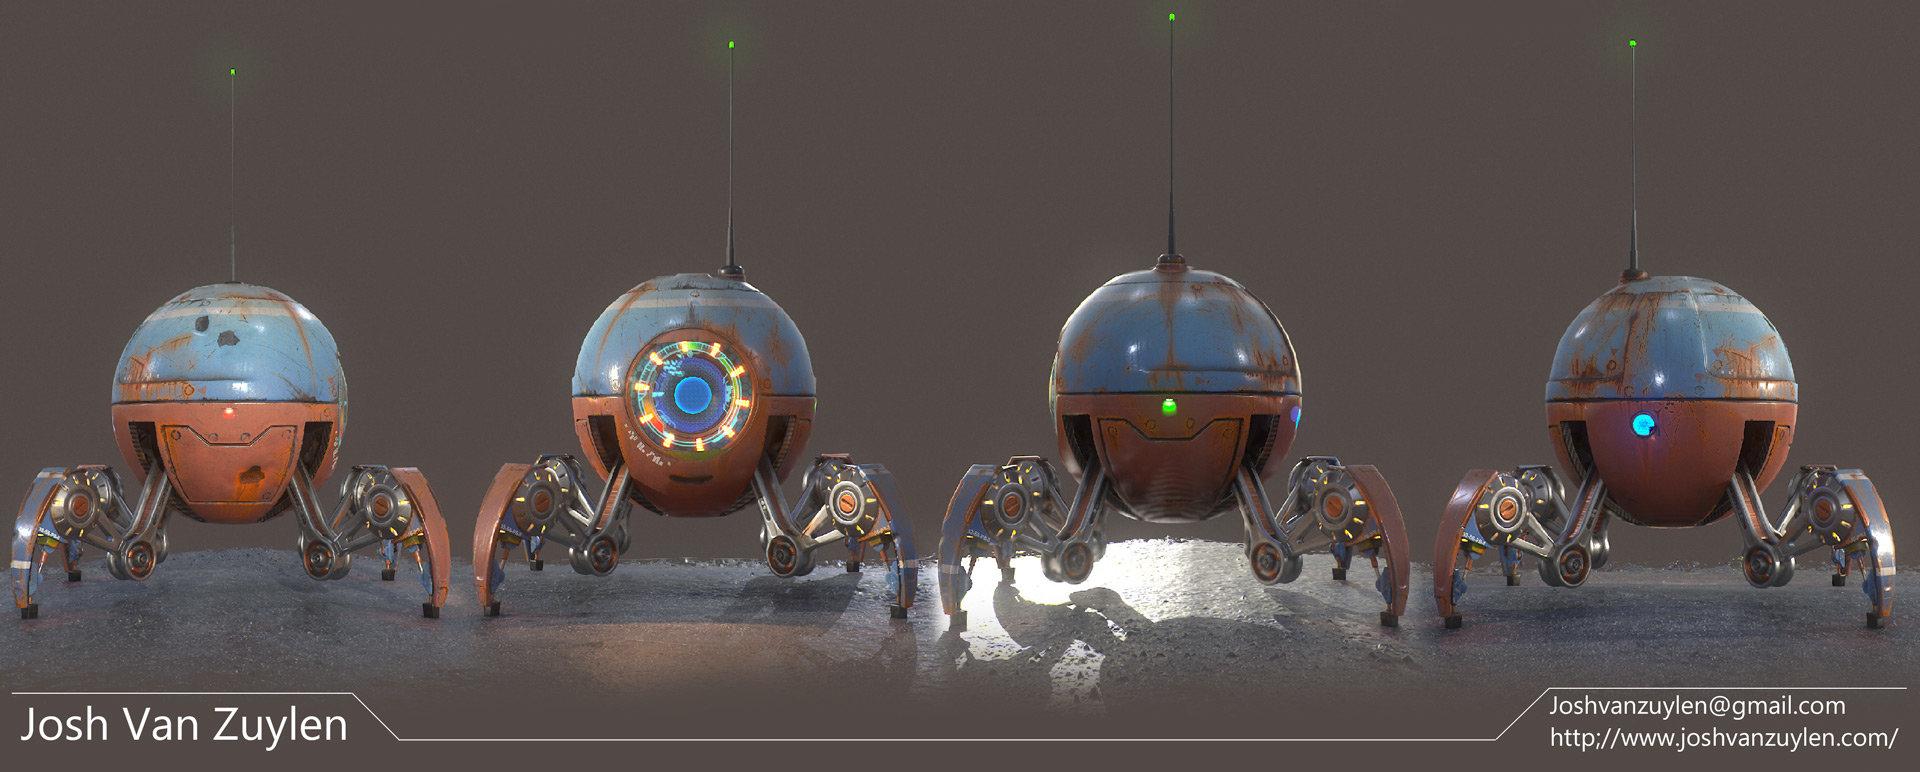 josh-van-zuylen-little-robot-final-6.jpg?1436955519